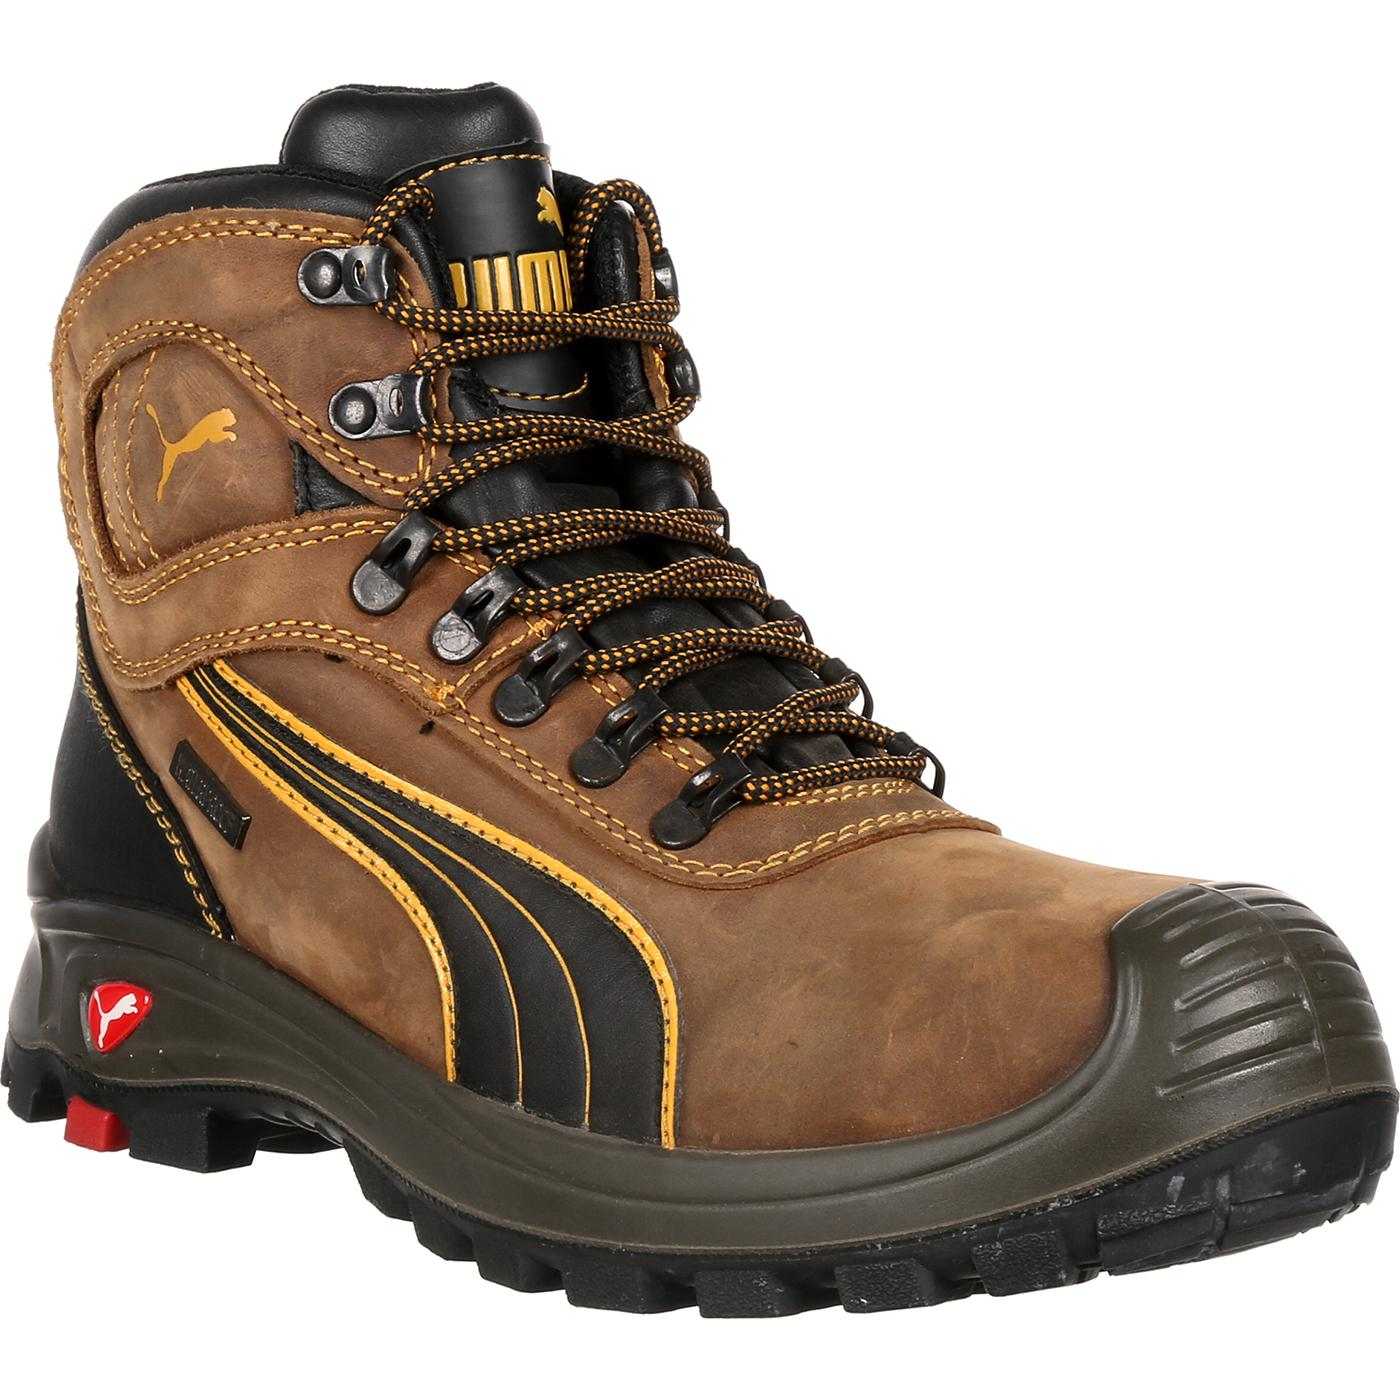 Calzado de alta trabajo de zapatilla de senderismo alta de impermeable de 5c5493